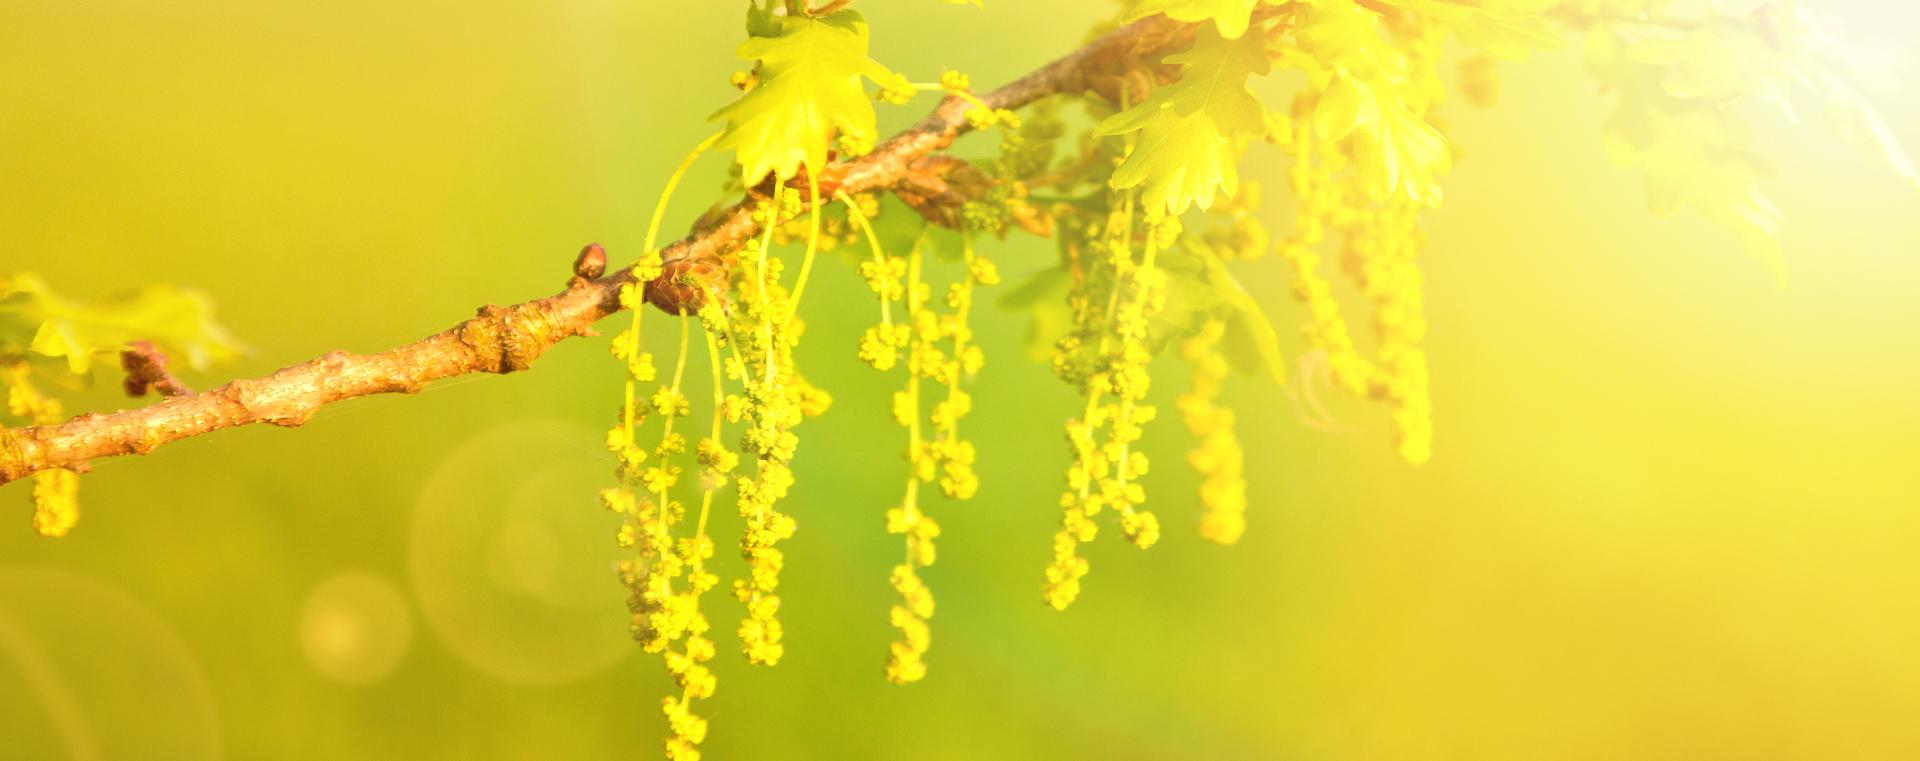 Nr 22 Oak Eiche Verzagtheit und Verzweiflung Lemon Pharma Original Bachblüten Dr. Bach